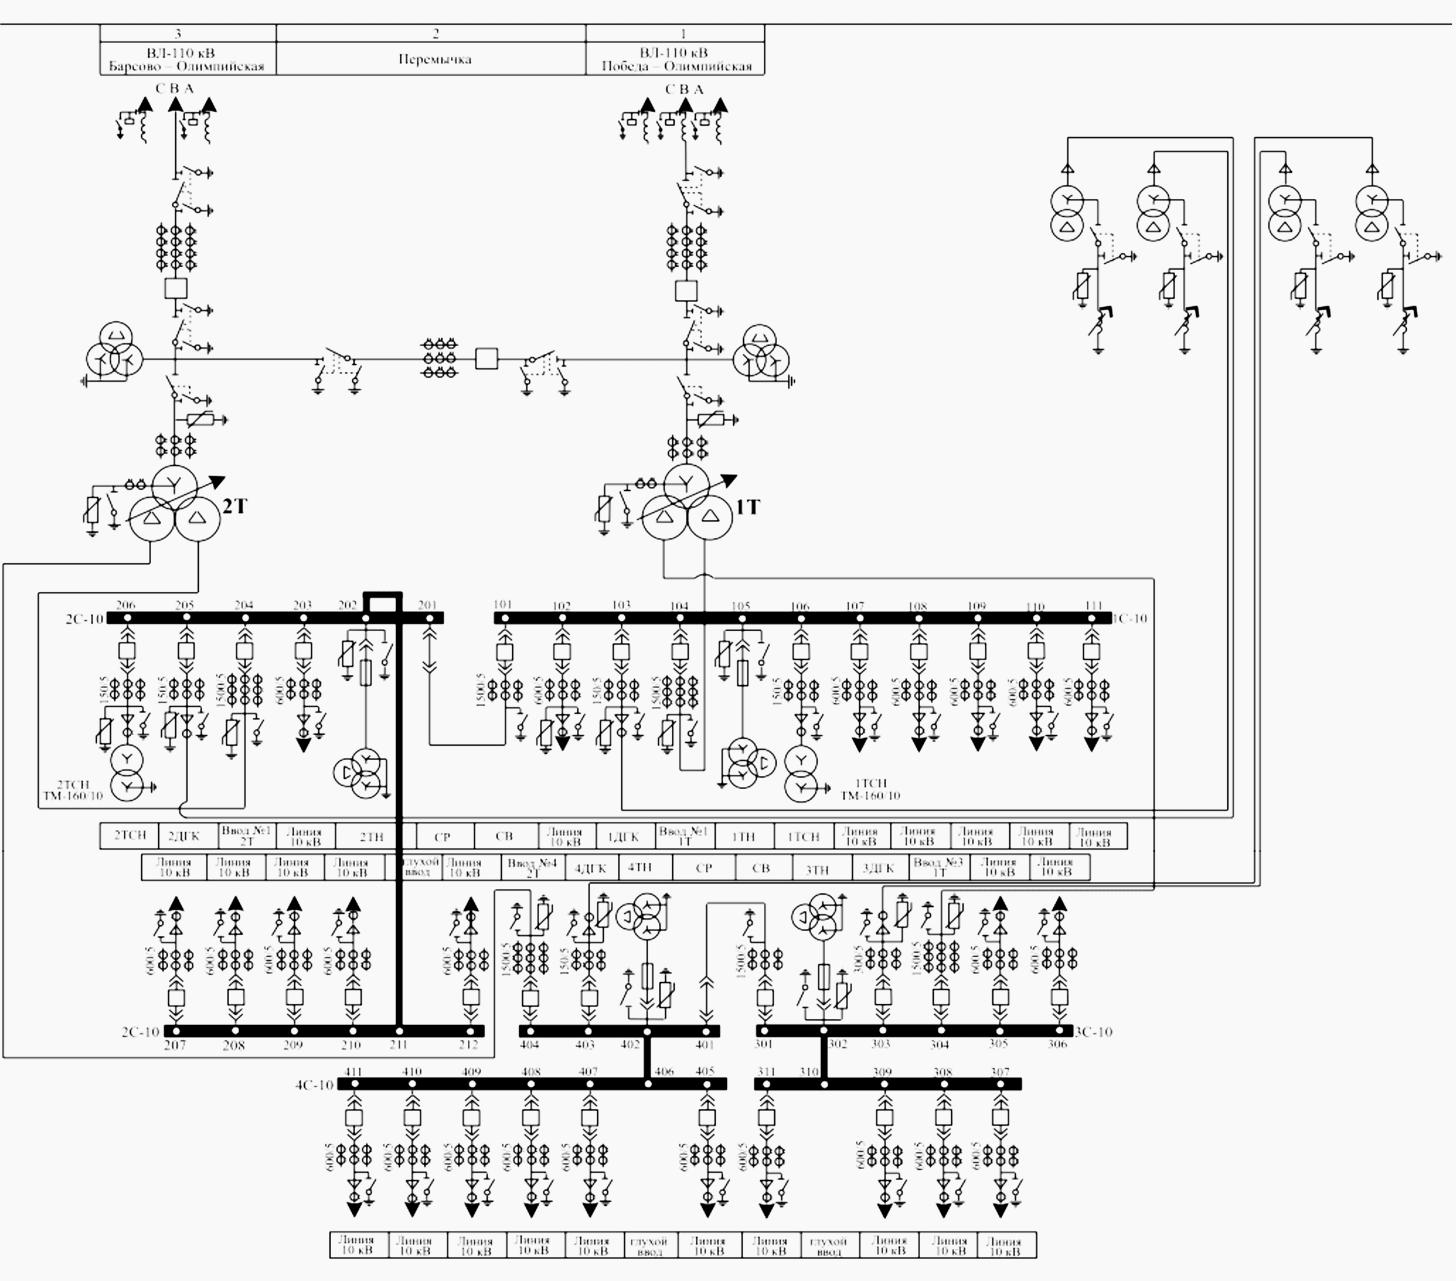 wiring diagram substation 1998 subaru impreza 110 10 kv with centralized protection